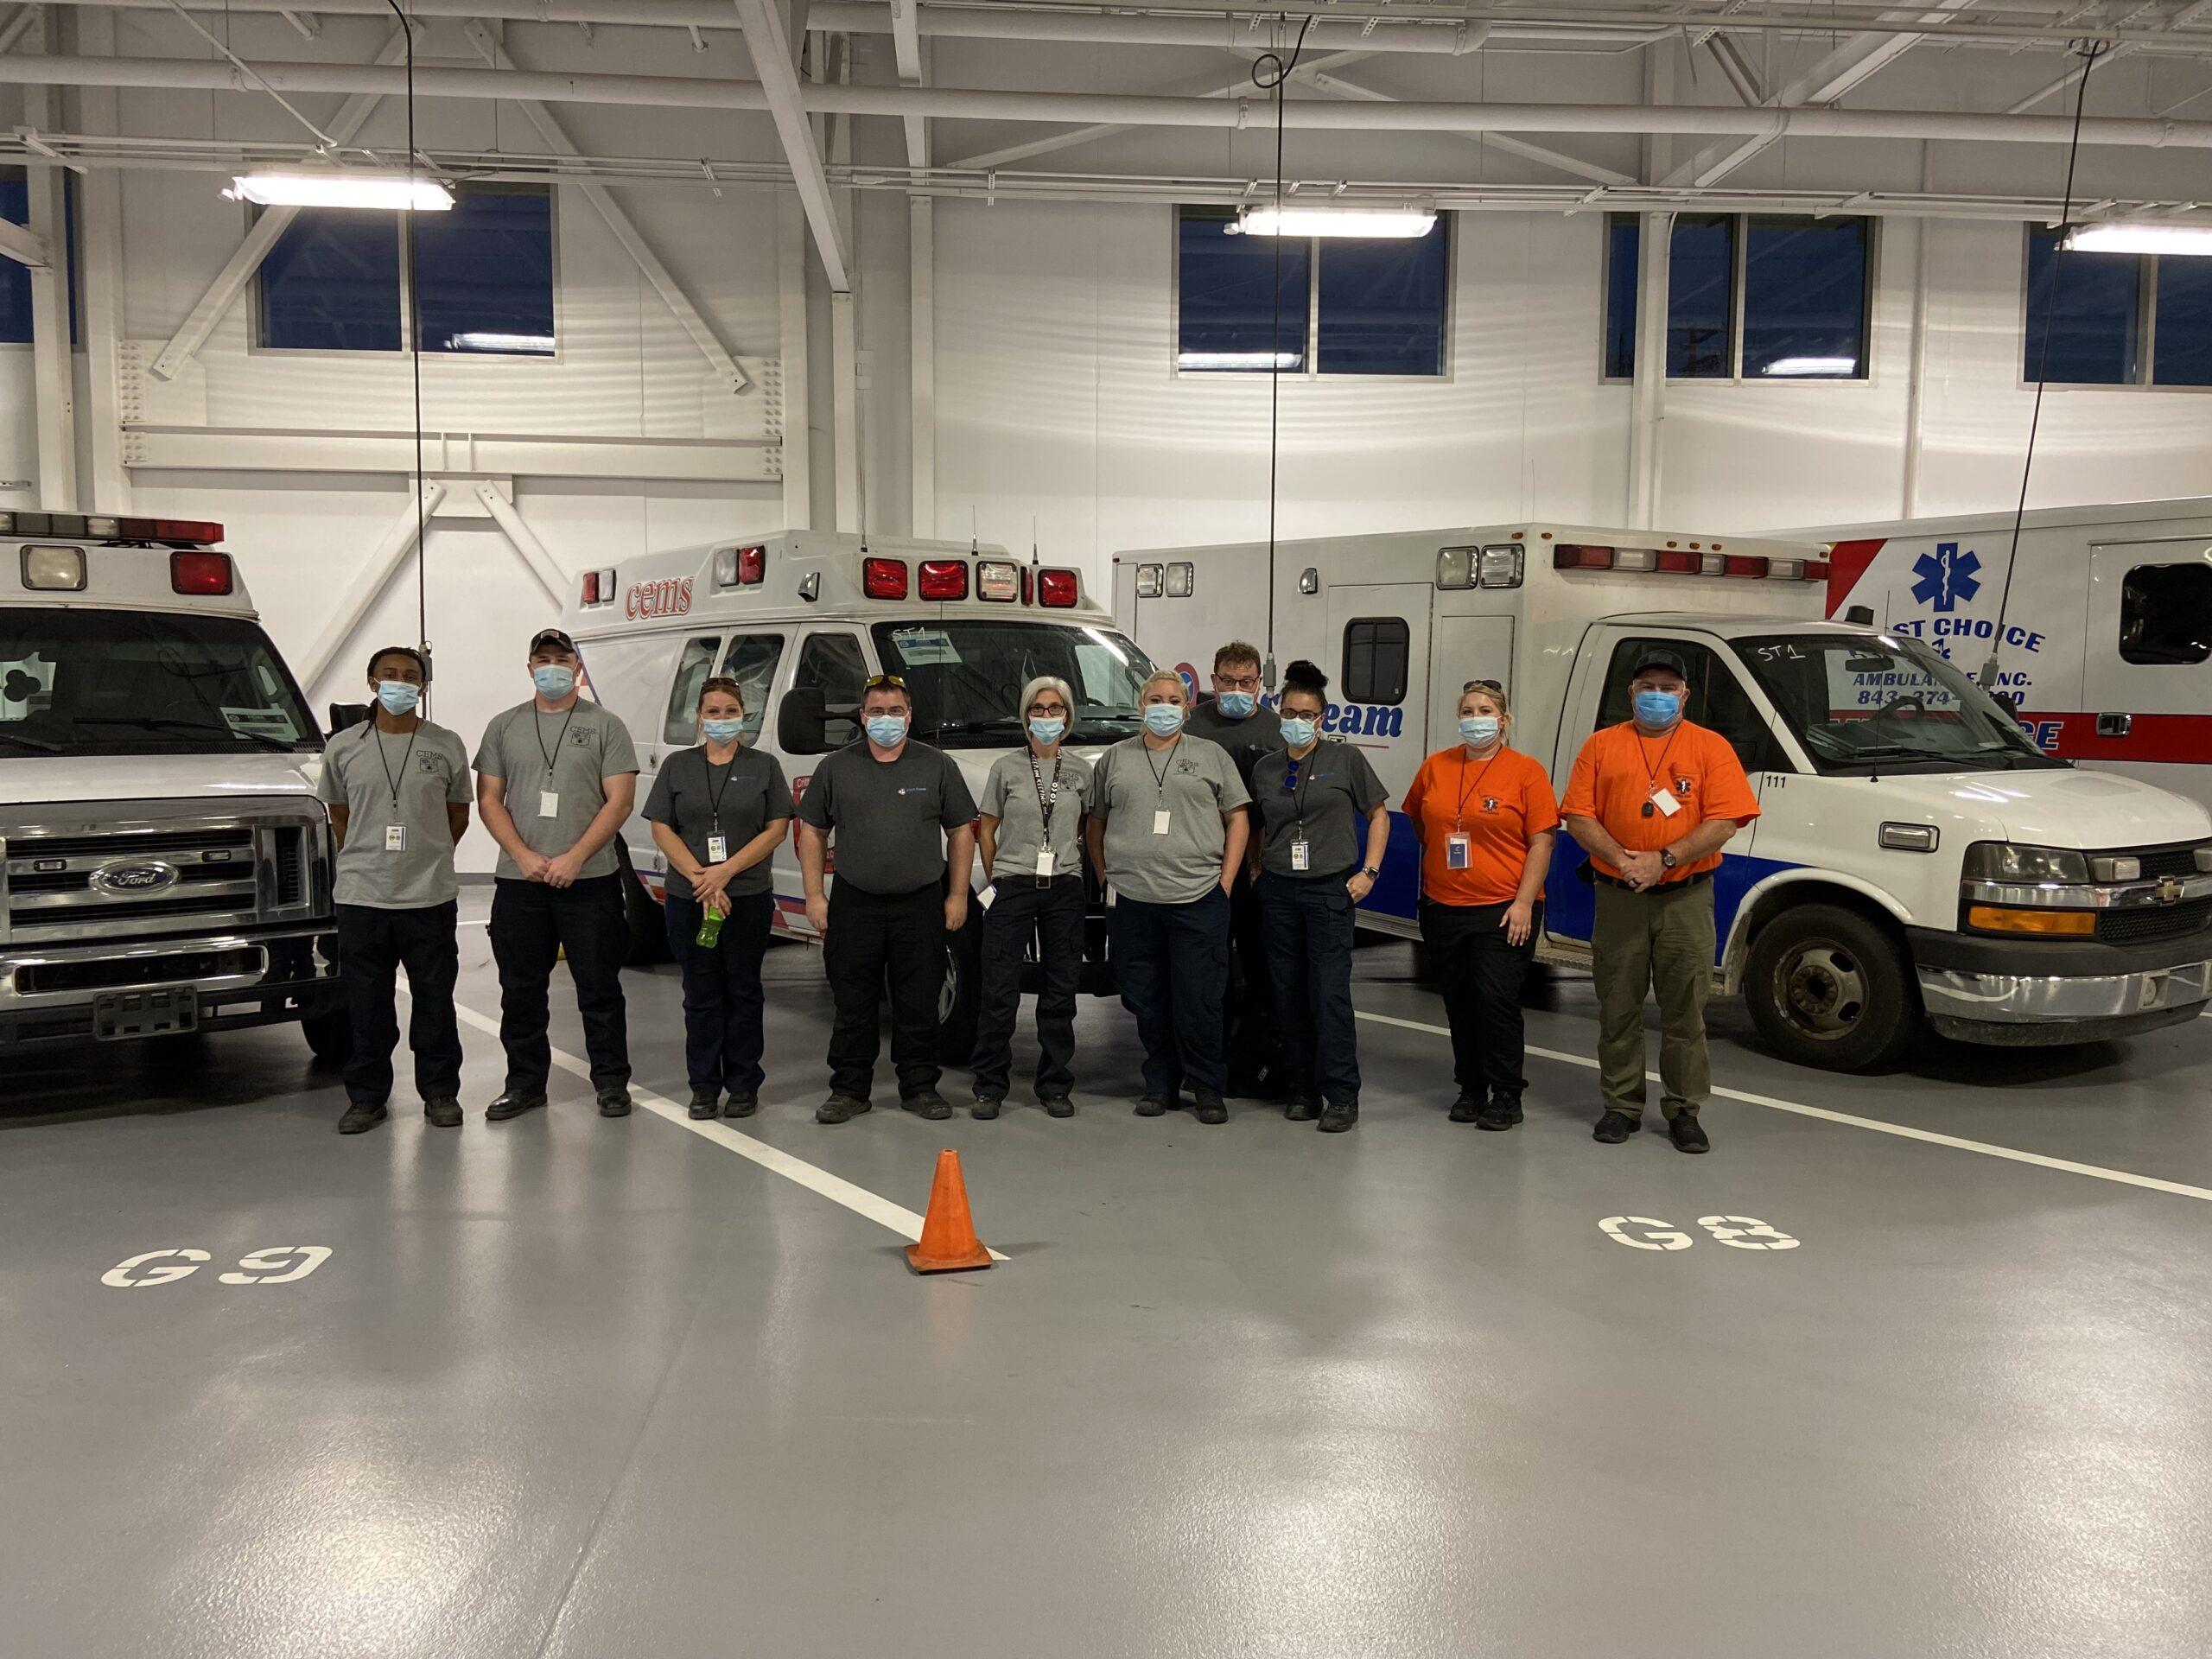 WSOC – FEMA Ambulance Strike Team Arrives in Mecklenburg County